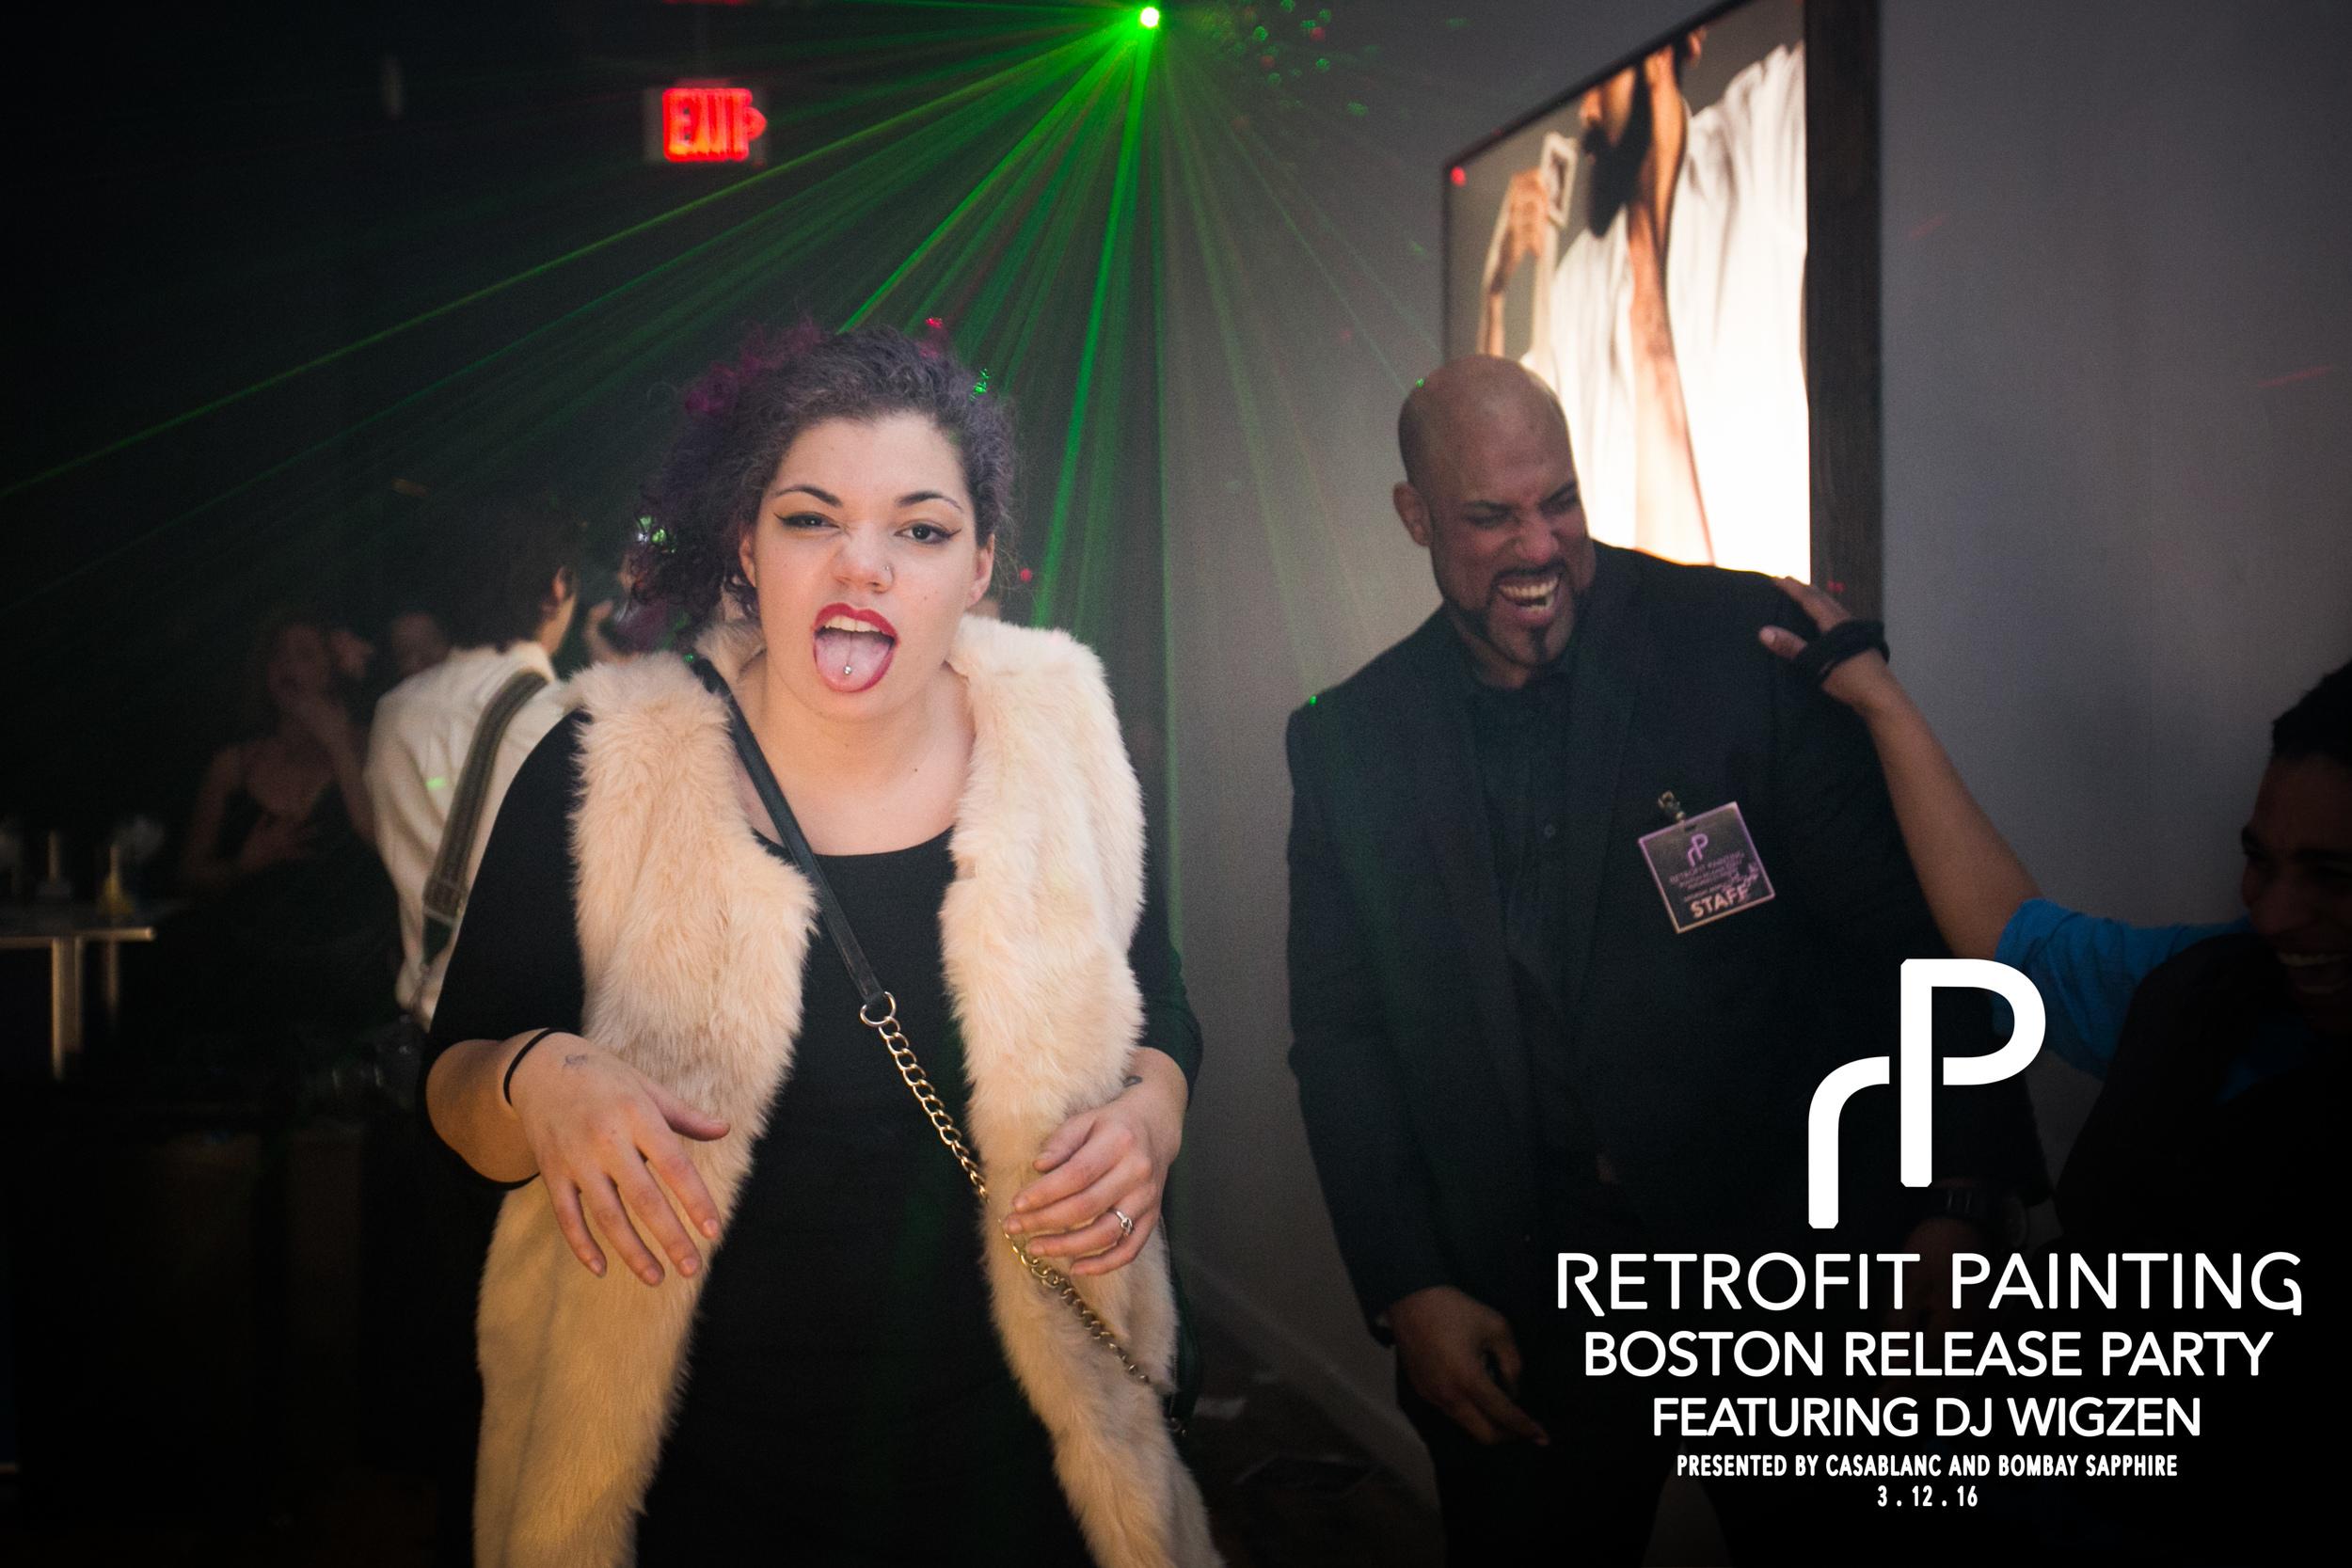 Retrofit Painting Boston Release Party 0213.jpg